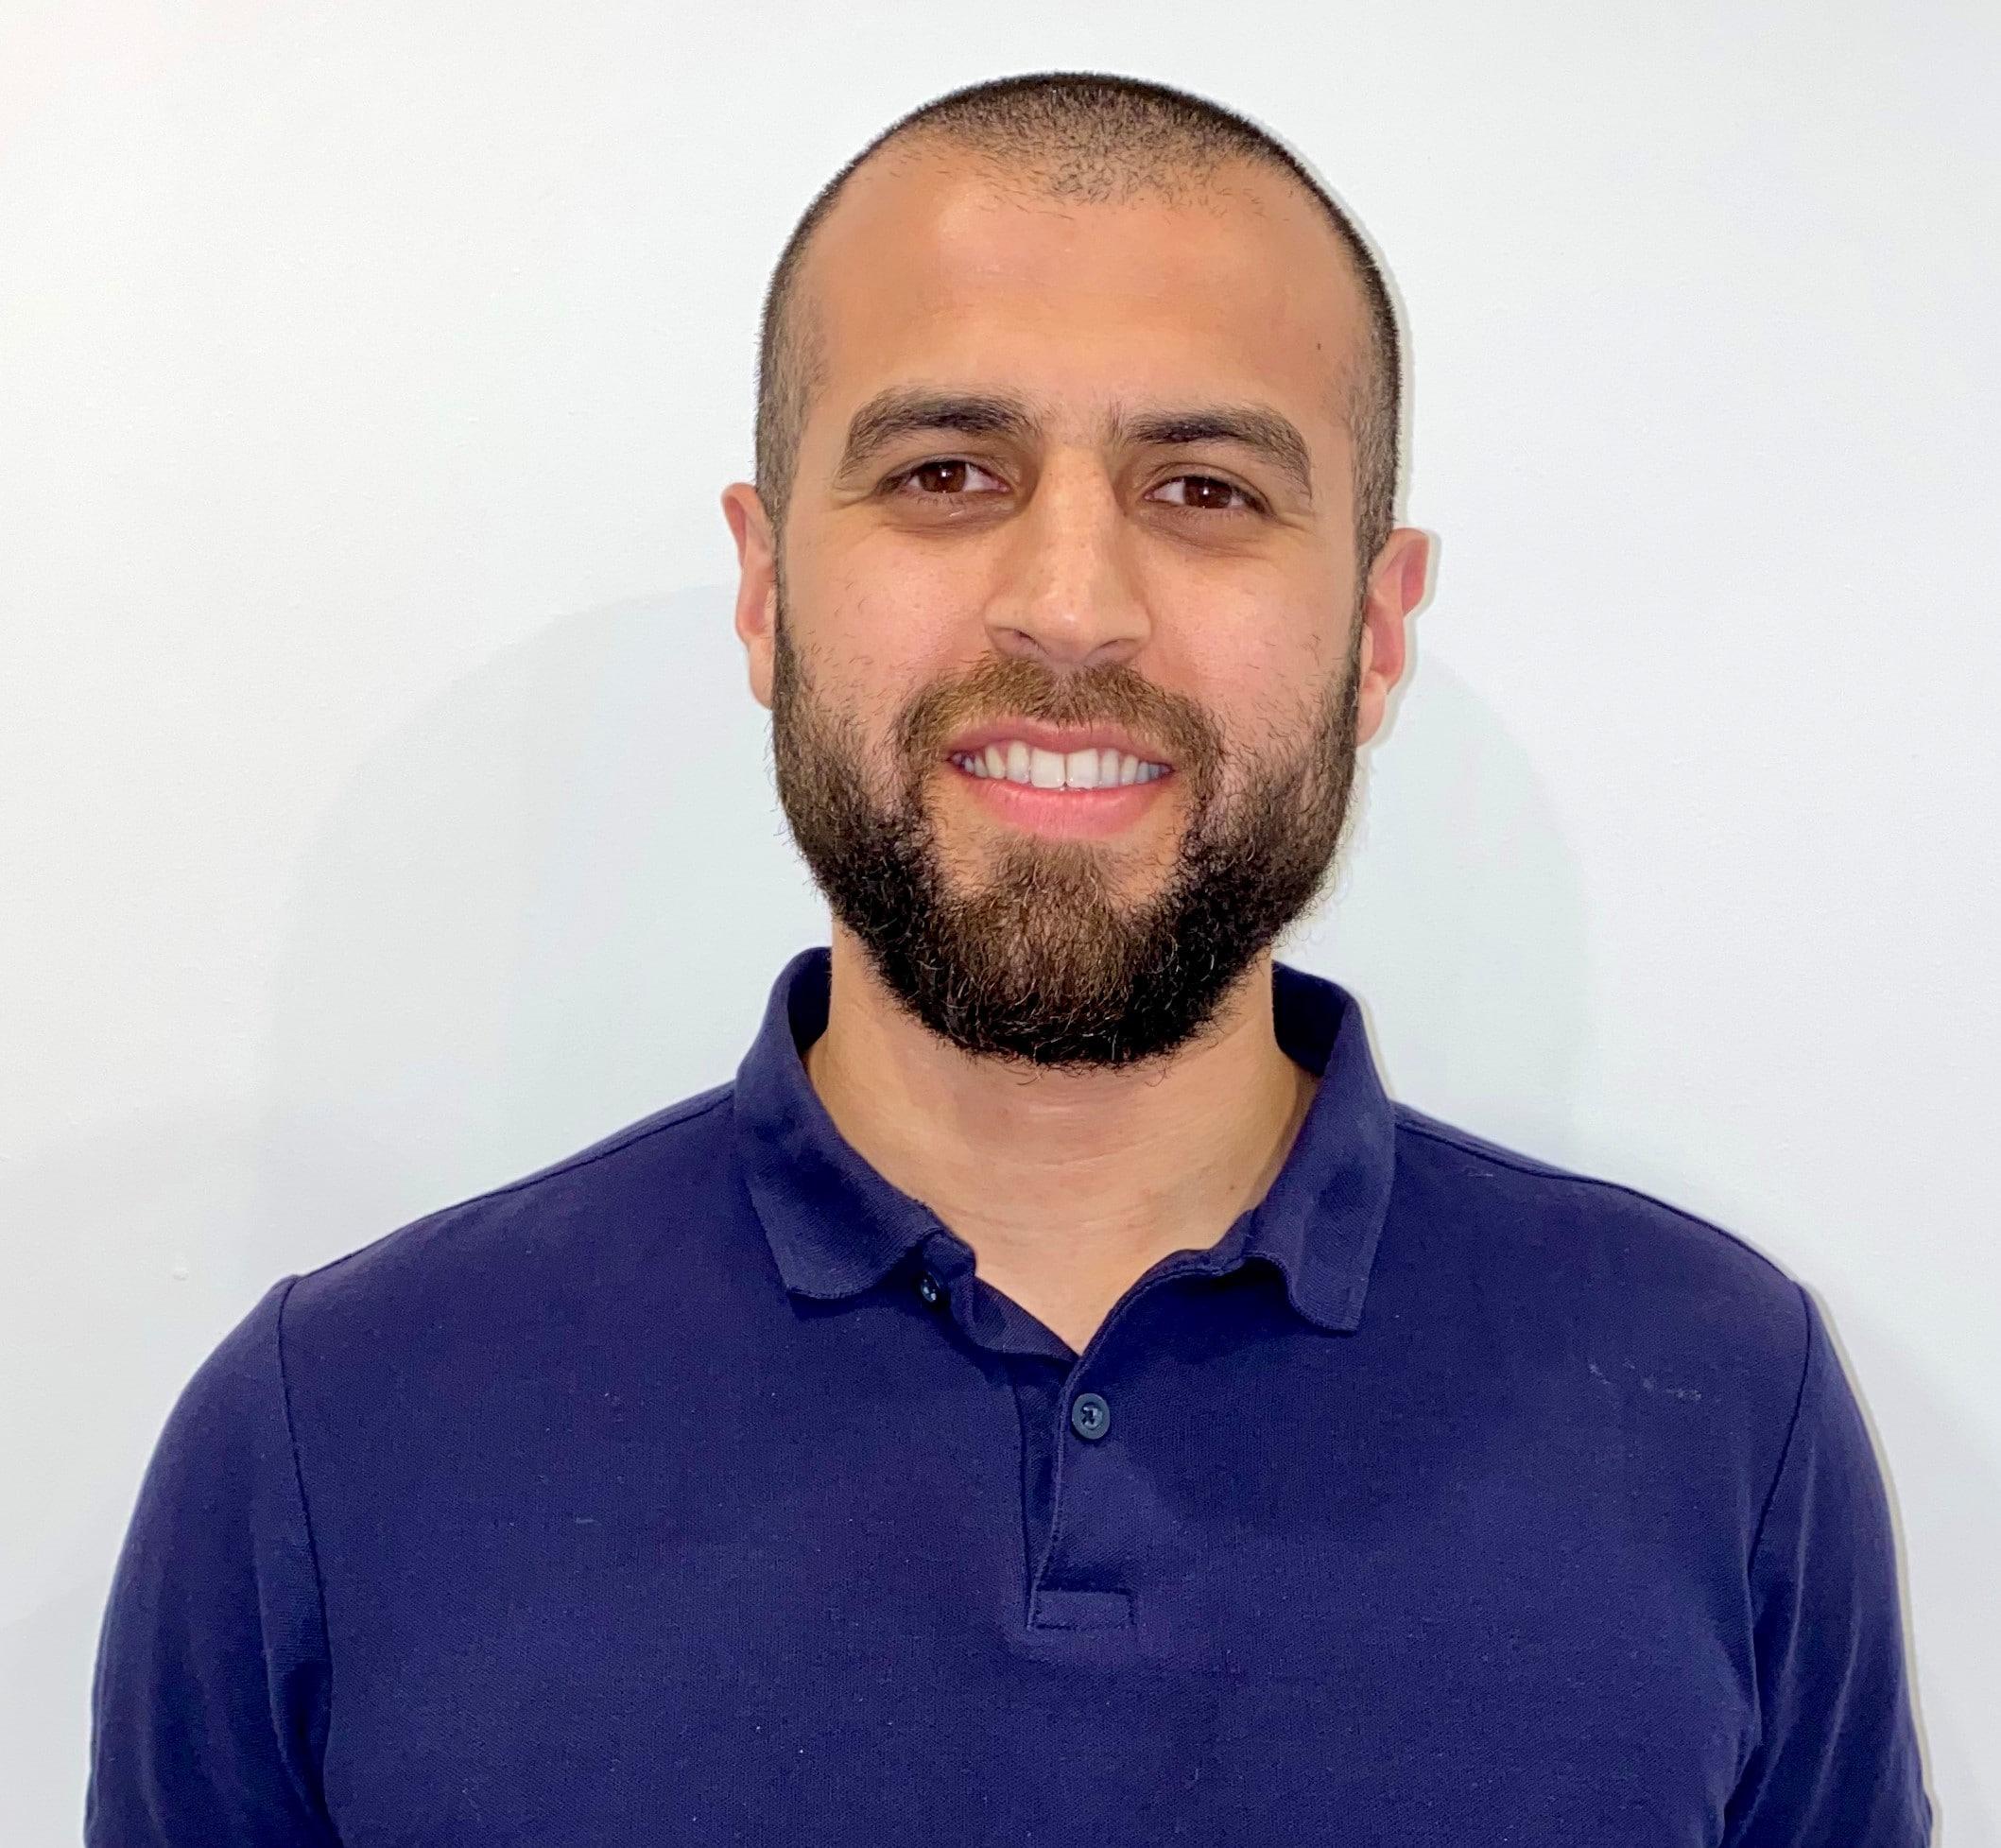 Bara Abdul-Salam